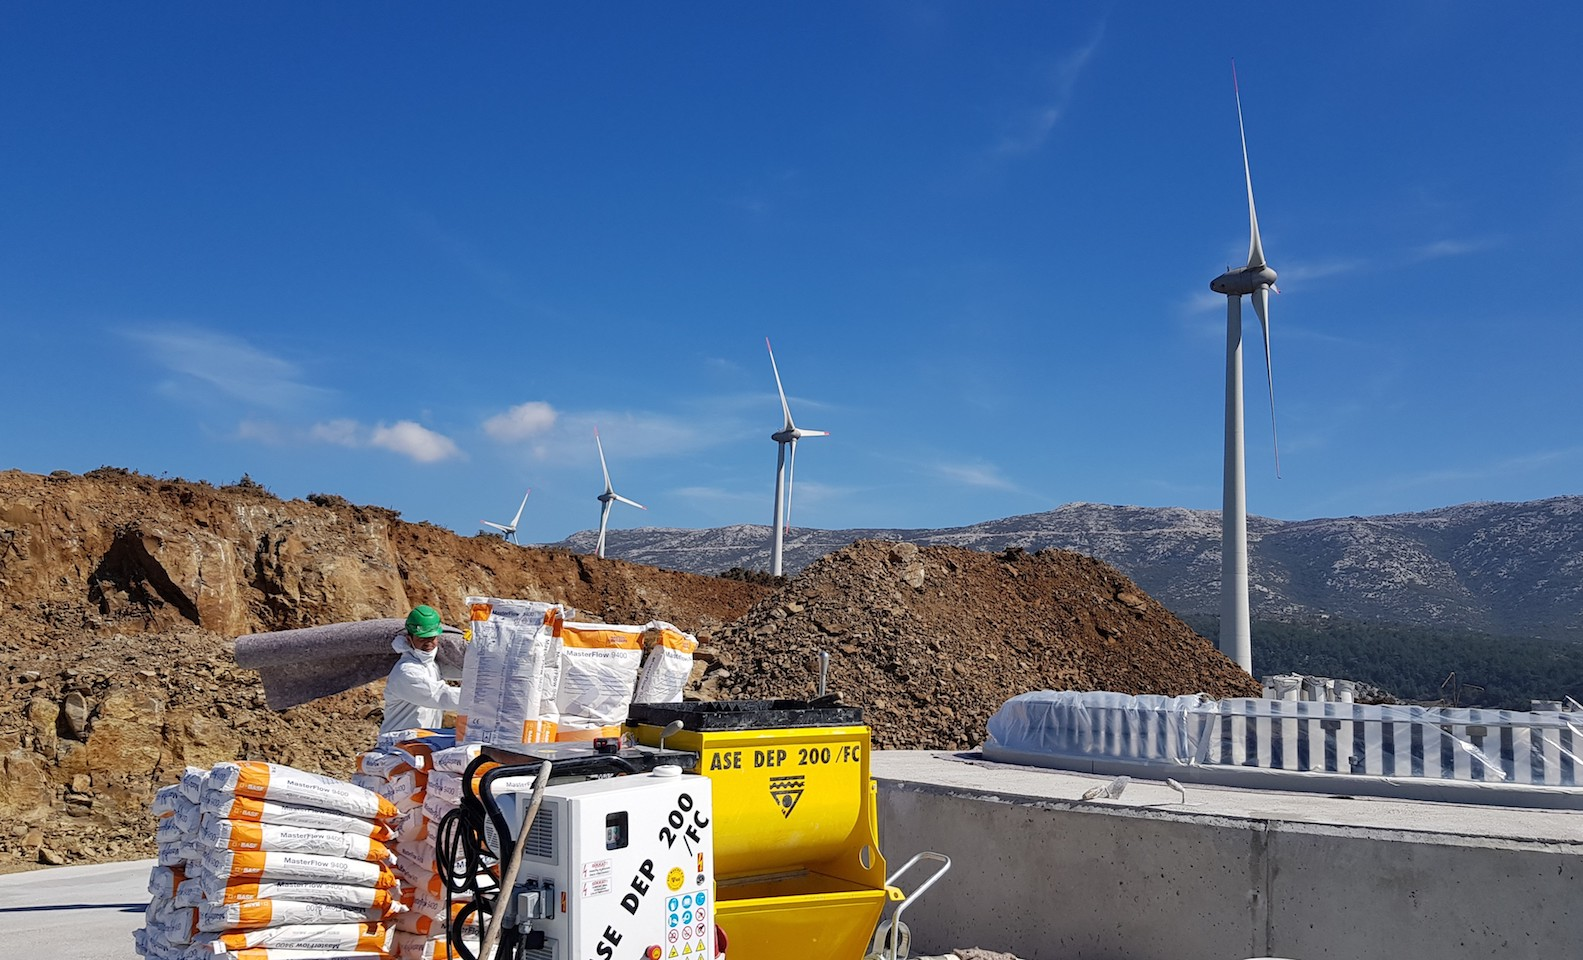 Rüzgar Enerji Santrali (RES) Load Ring Grout Uygulaması